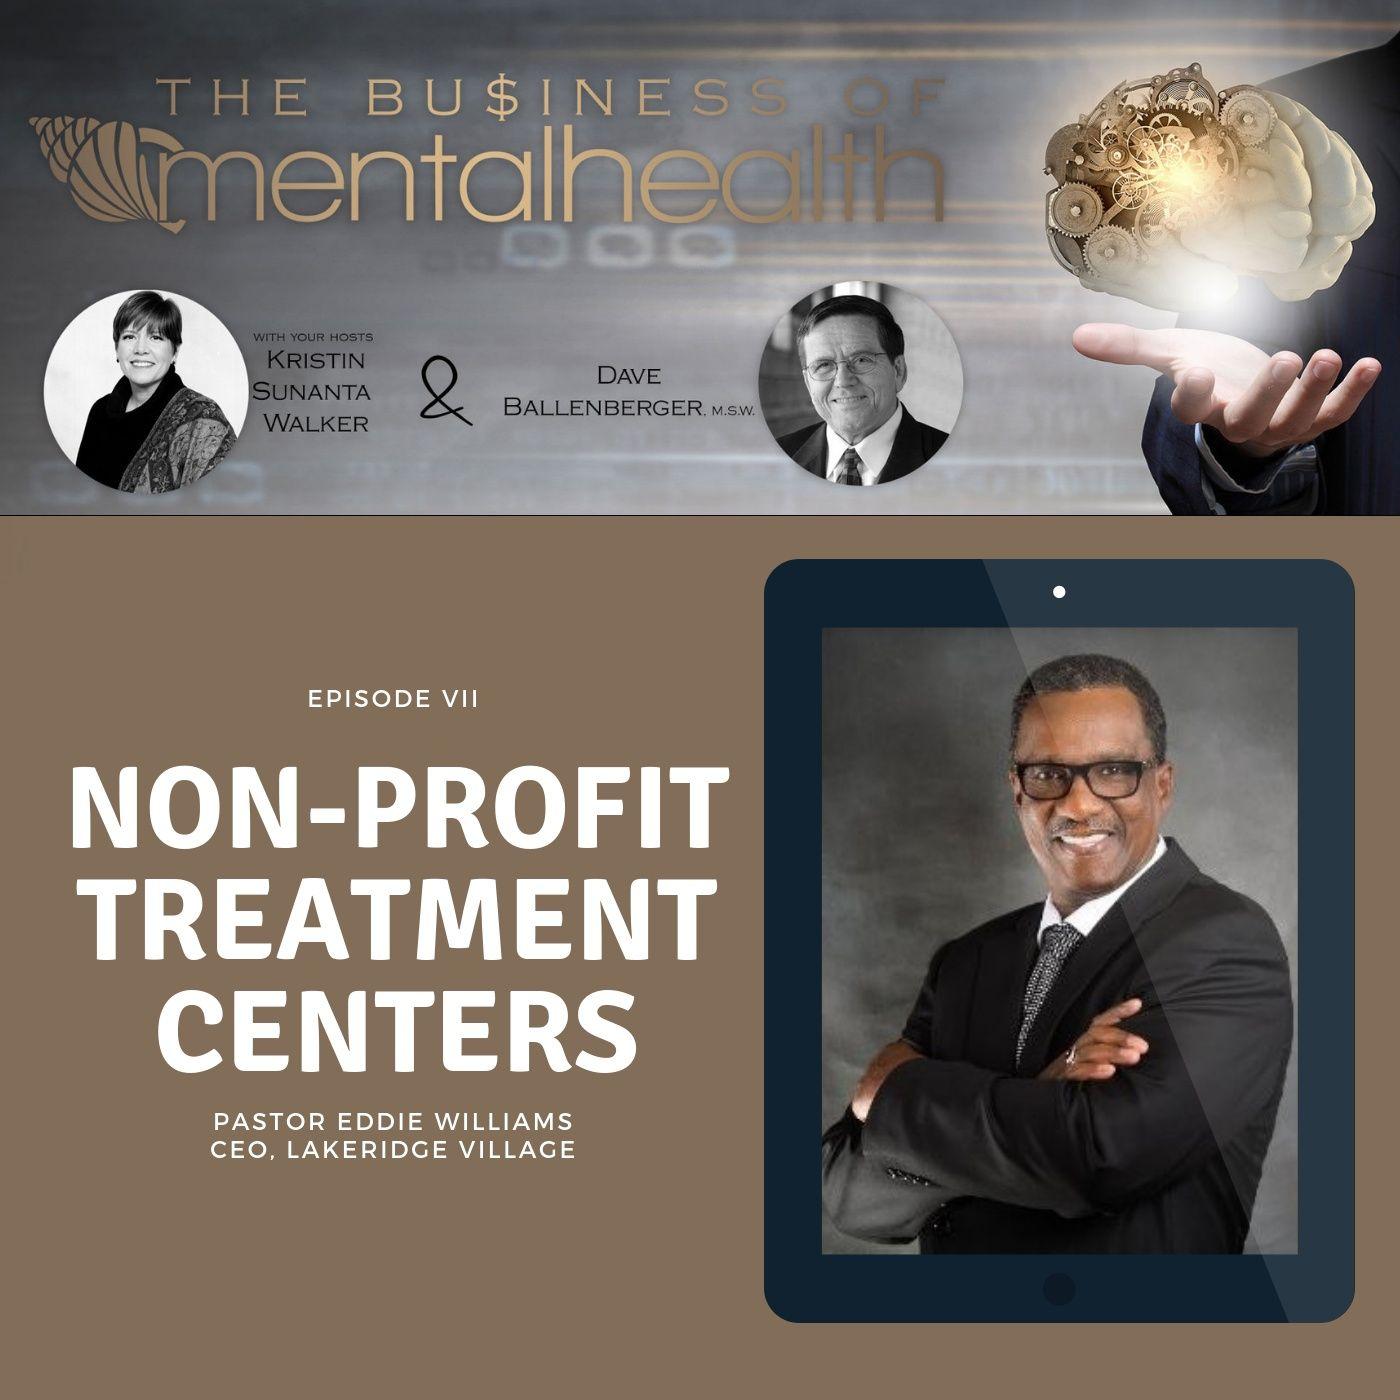 Mental Health News Radio - Mental Health Business: Non-Profit Treatment Centers with Pastor Eddie Williams